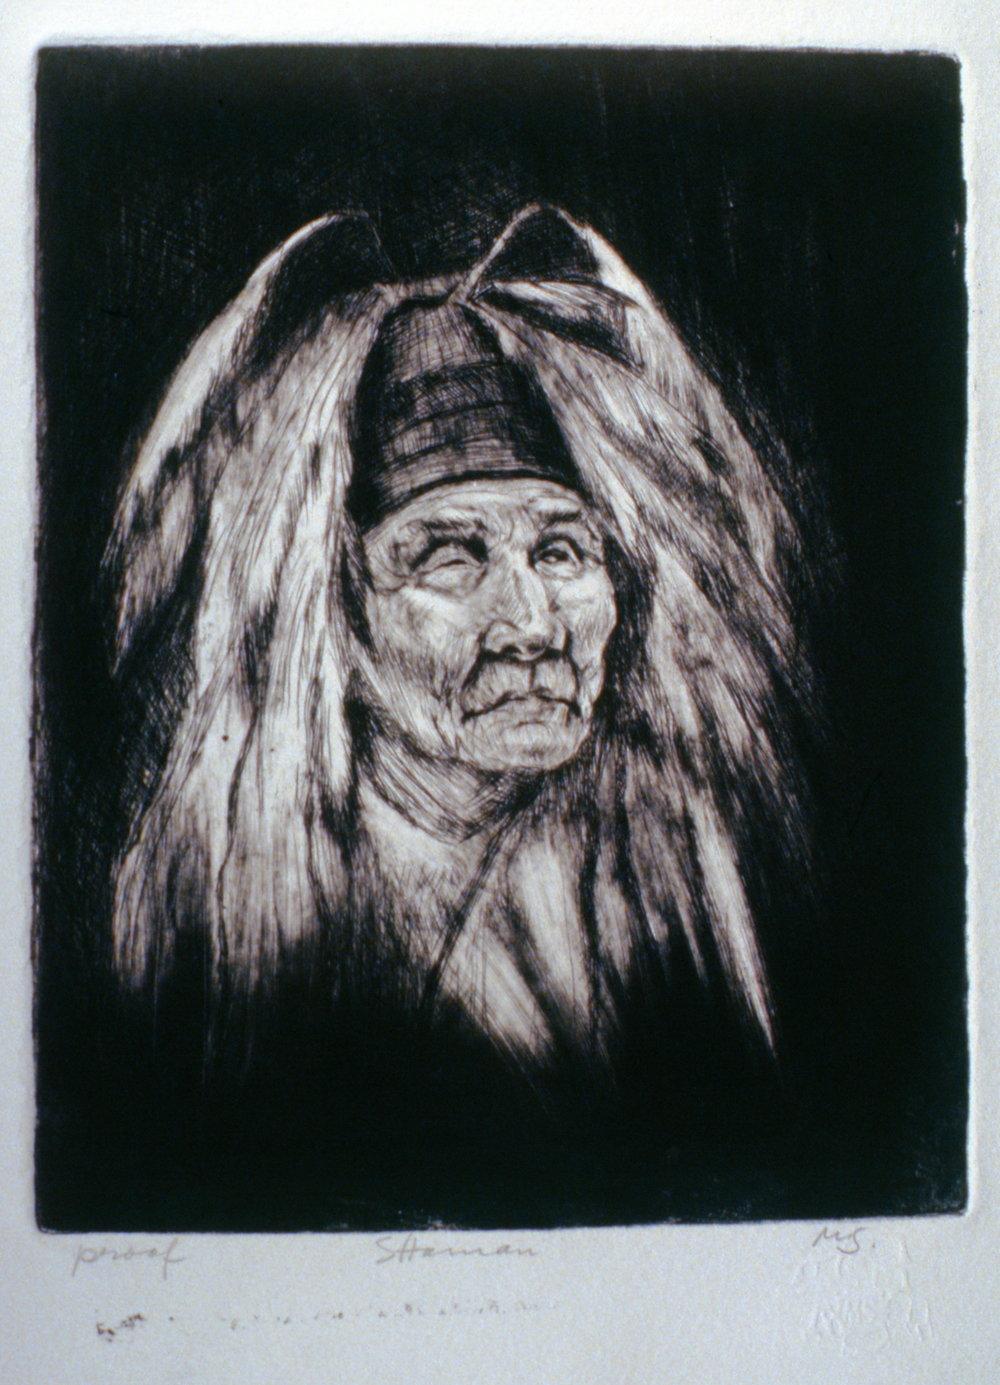 Shaman, 1980, Minn Sjløseth, artist proof, 25 x 20 cm, 1996.02.08